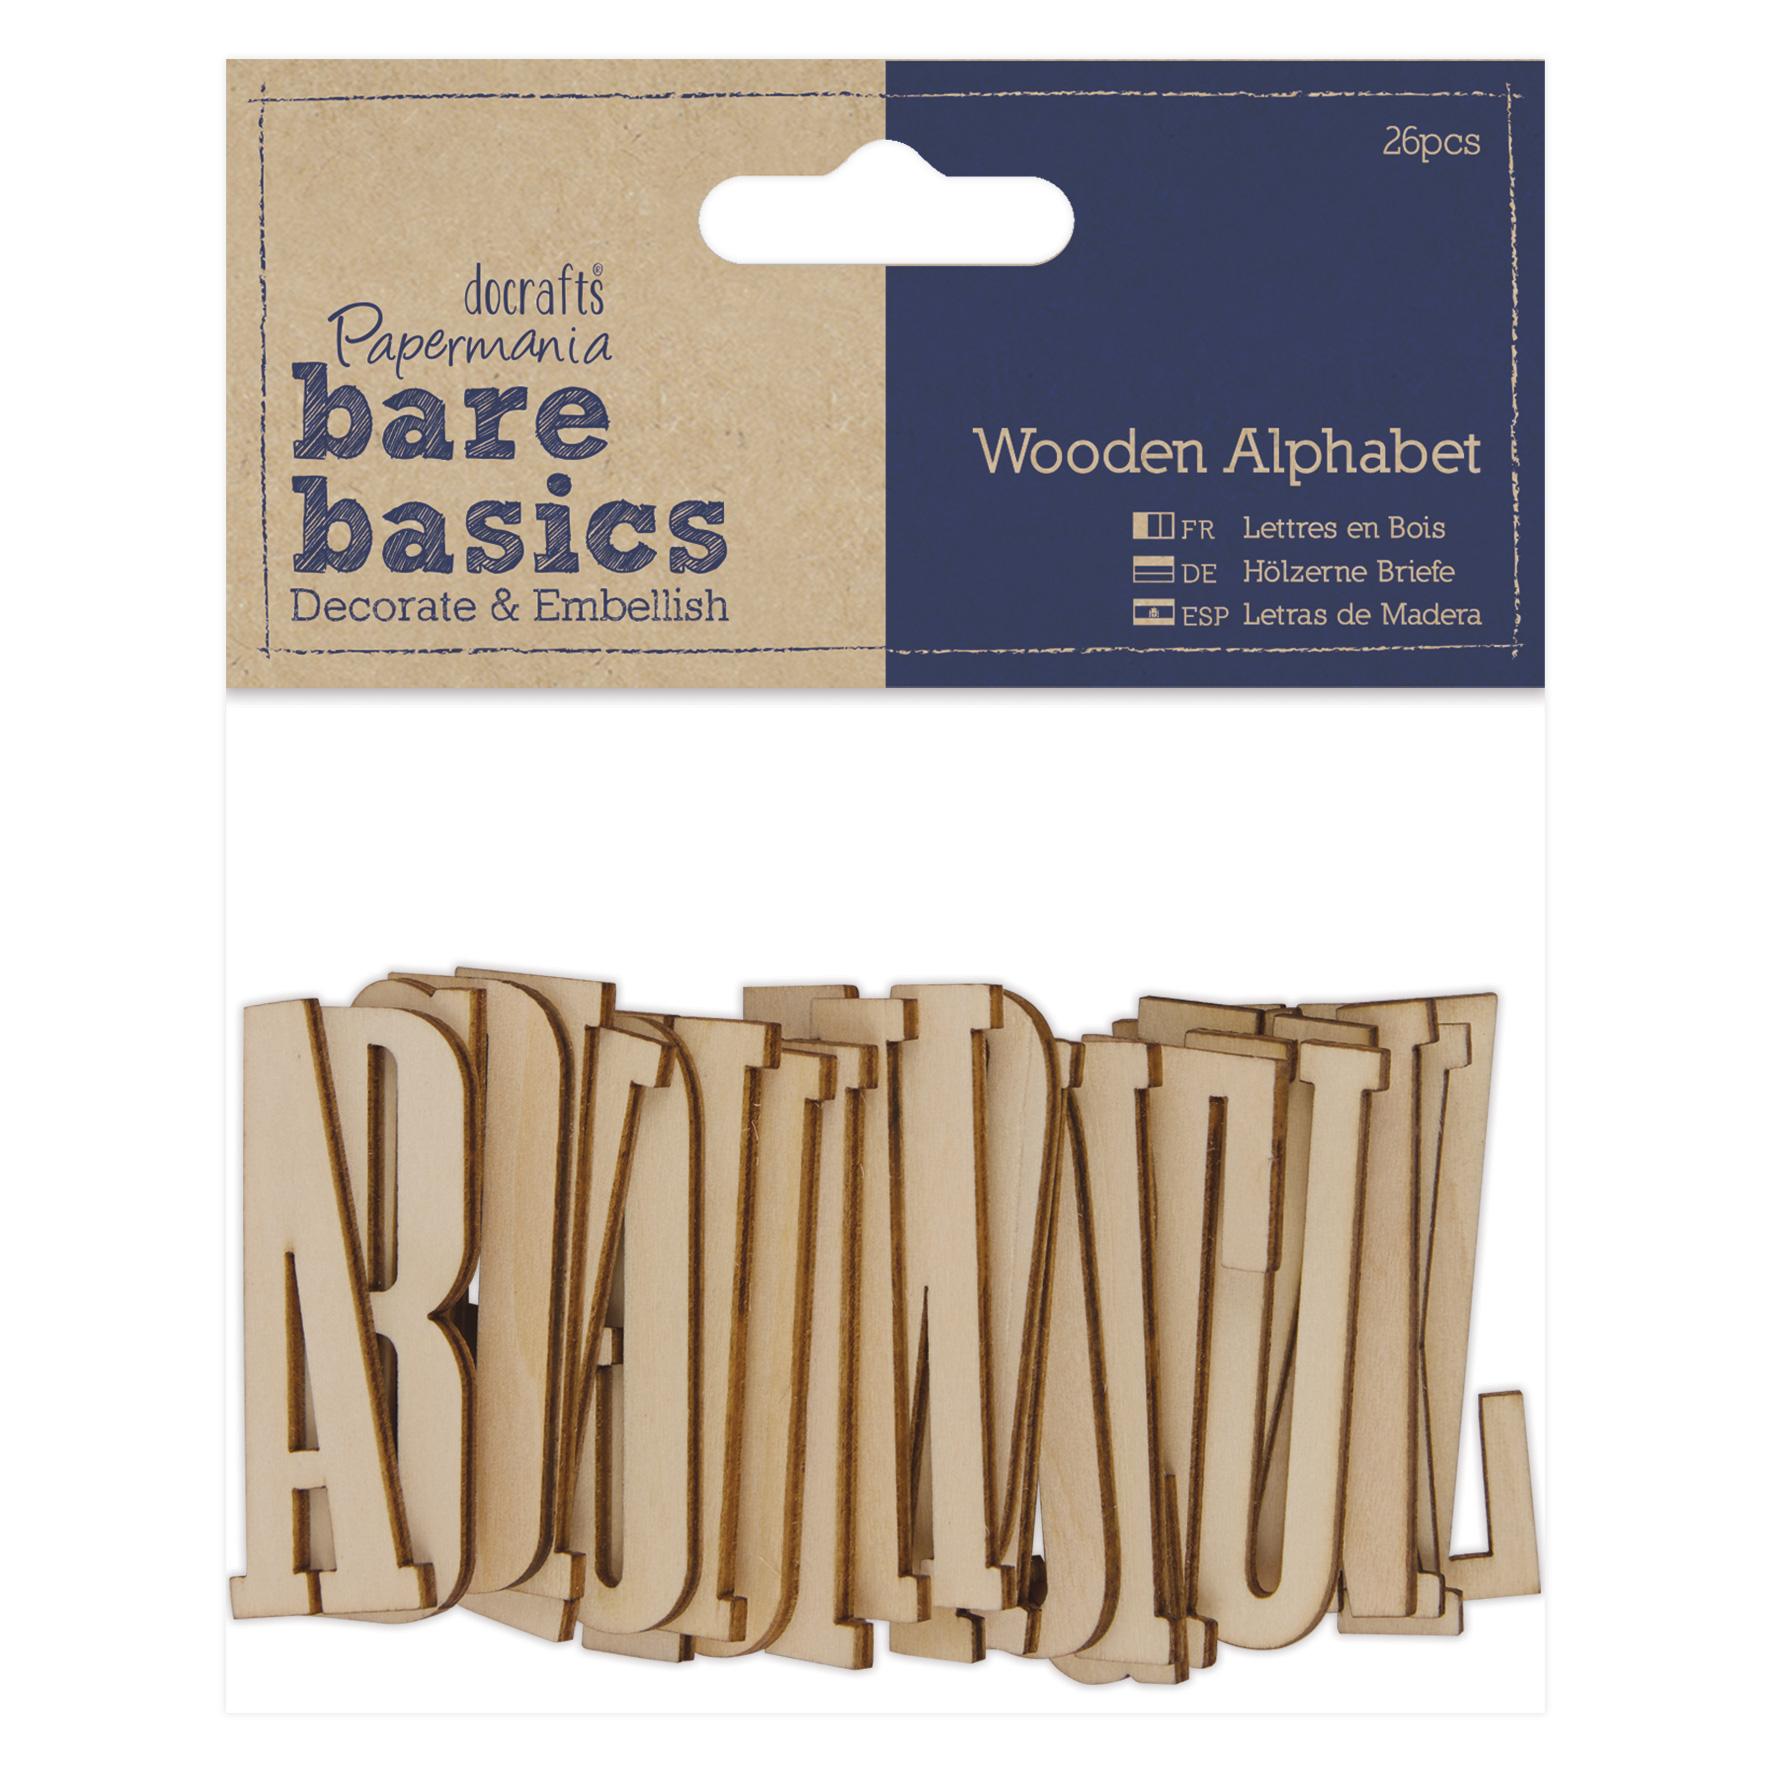 papermania alphabet buchstaben aus holz 5cm 26stk. Black Bedroom Furniture Sets. Home Design Ideas